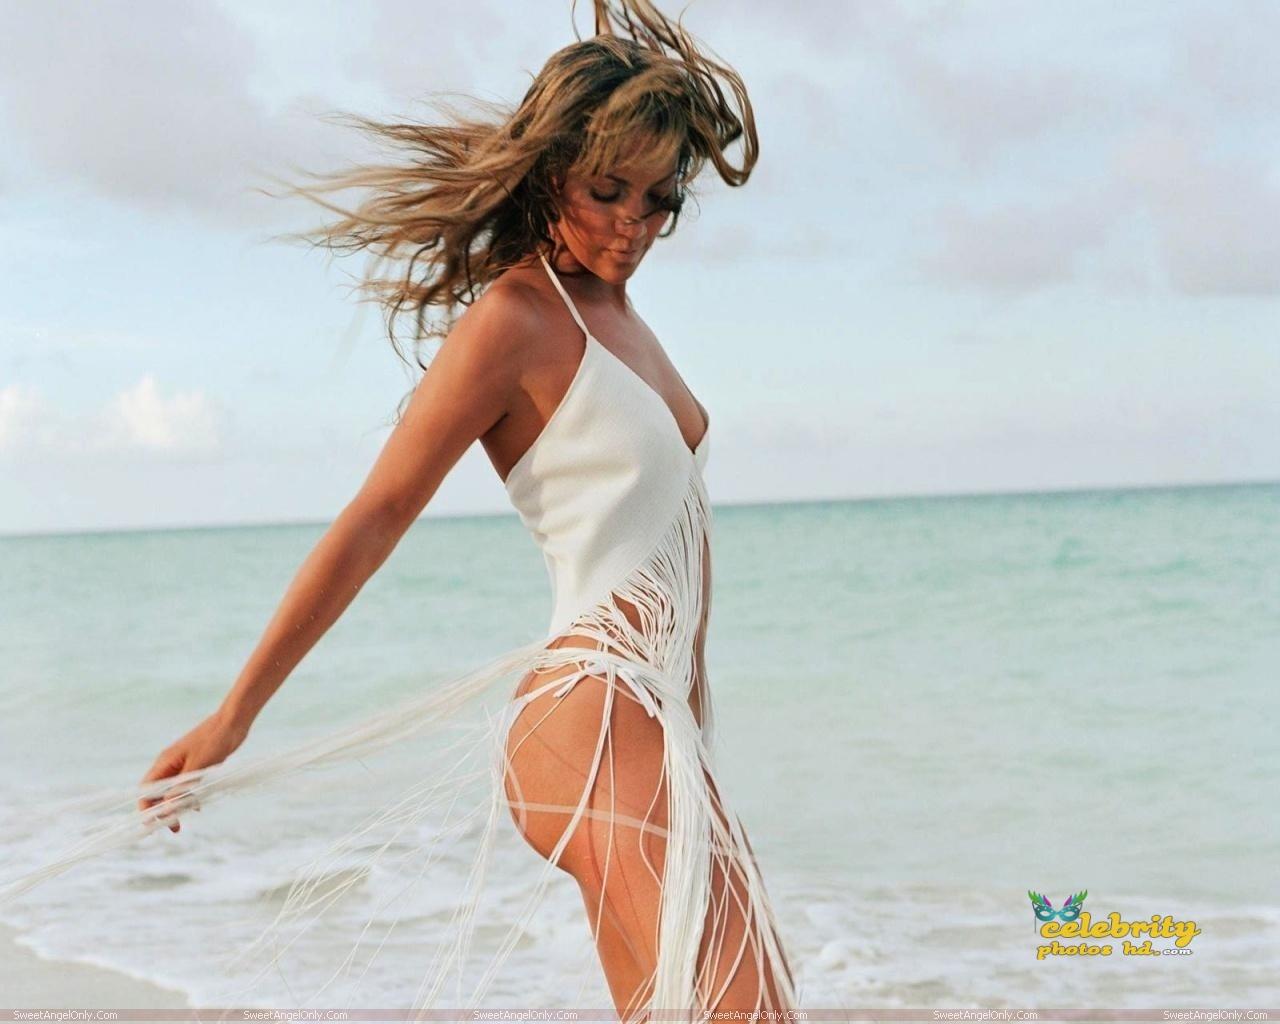 actress-jennifer-lopez-hot-wallpapers-in-bikini-sweetangelonly-hot-767432580